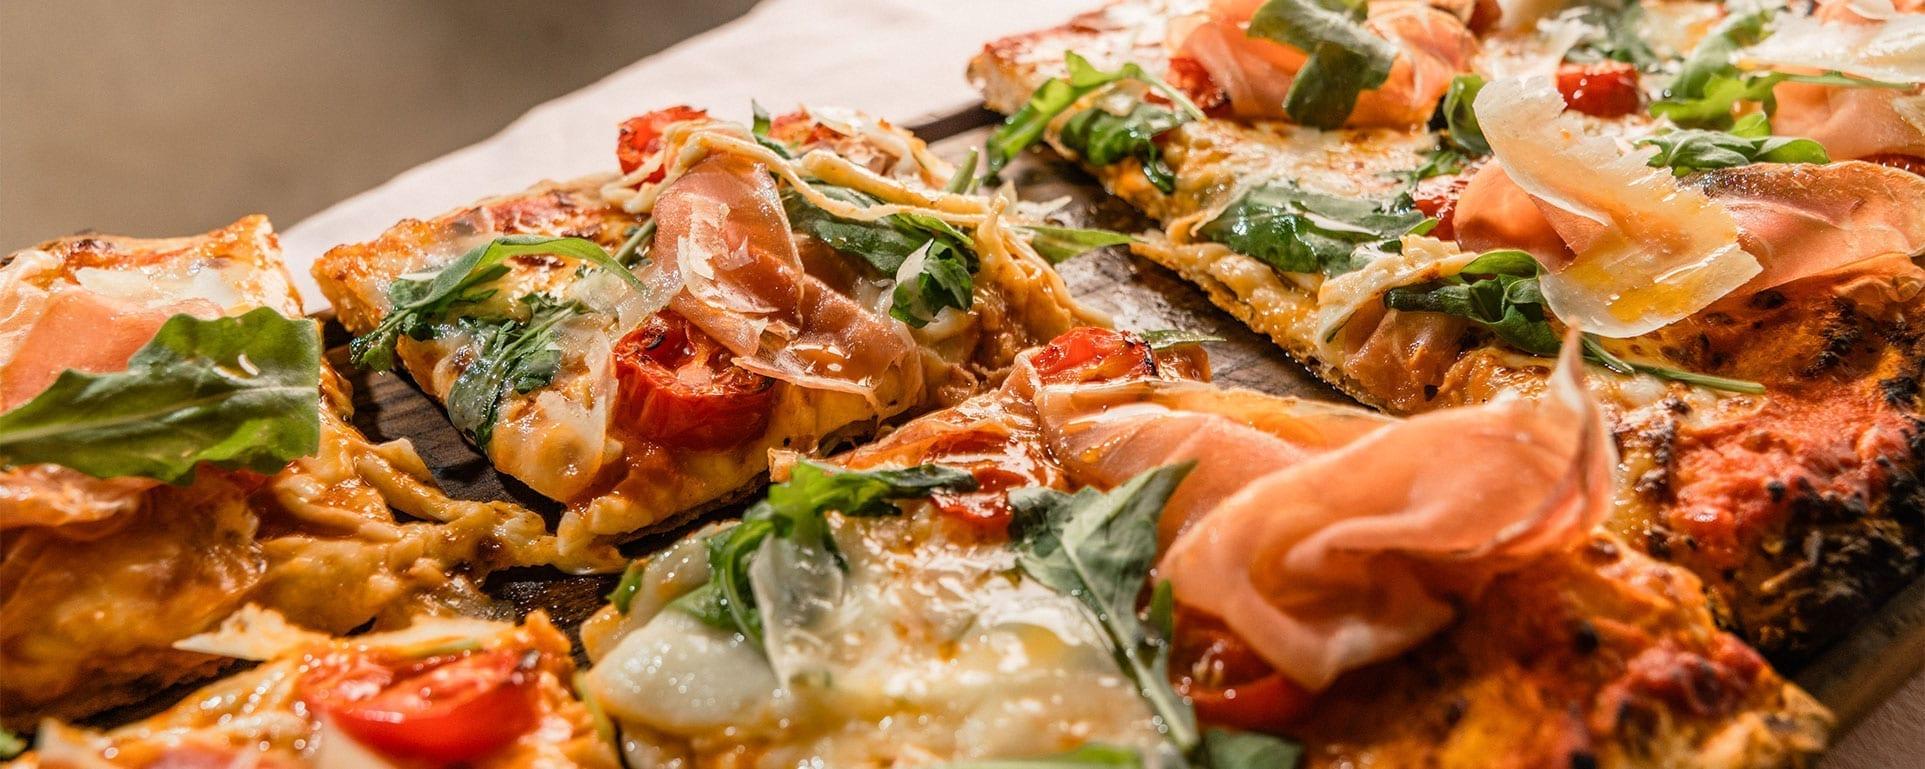 Pizza alla pala - Julius Restaurant in Schladming